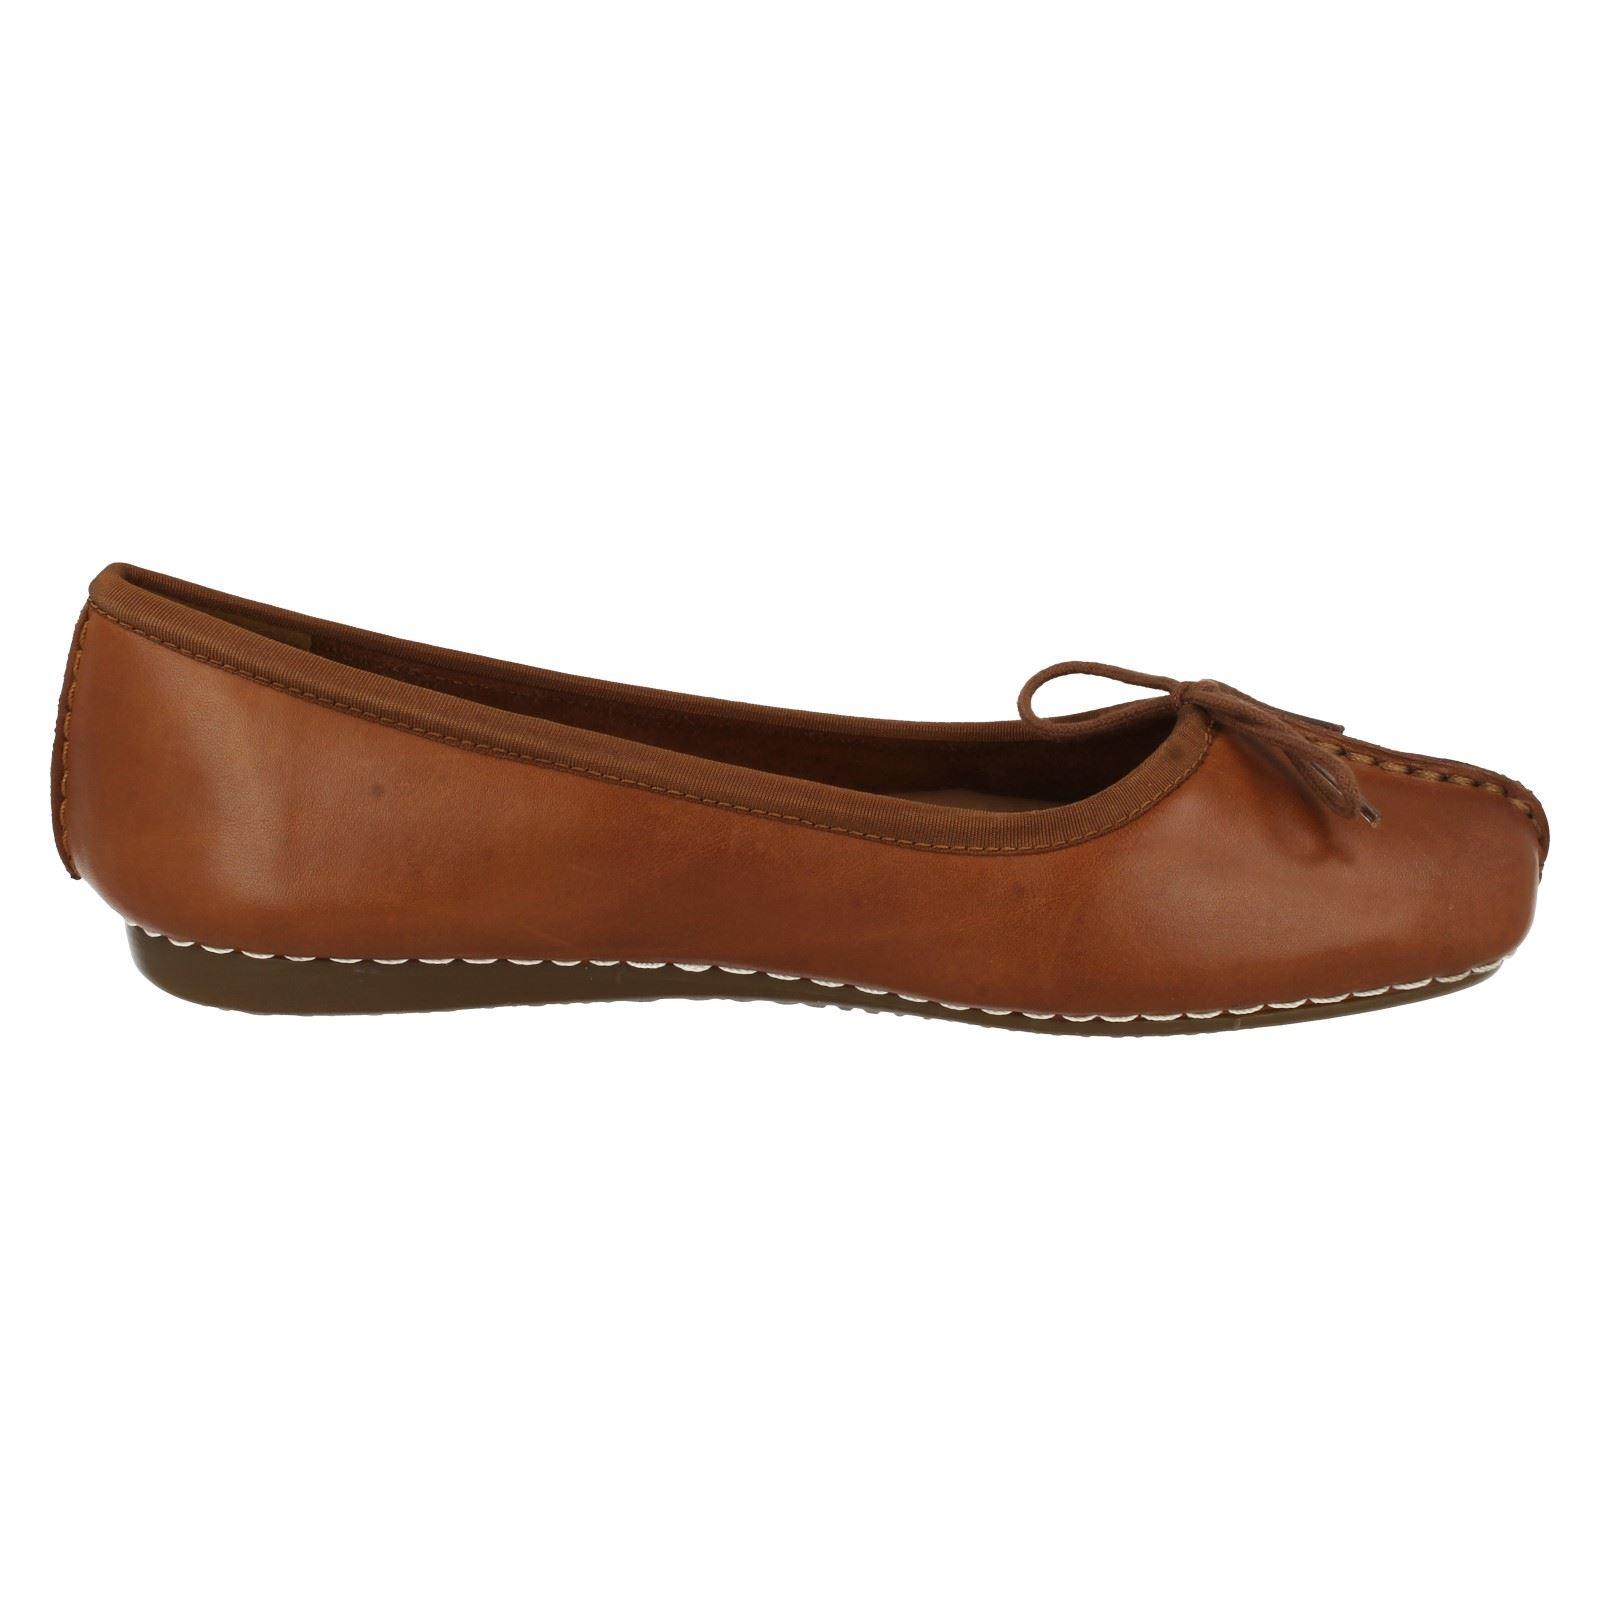 Comfortable Flats Ladies Shoes